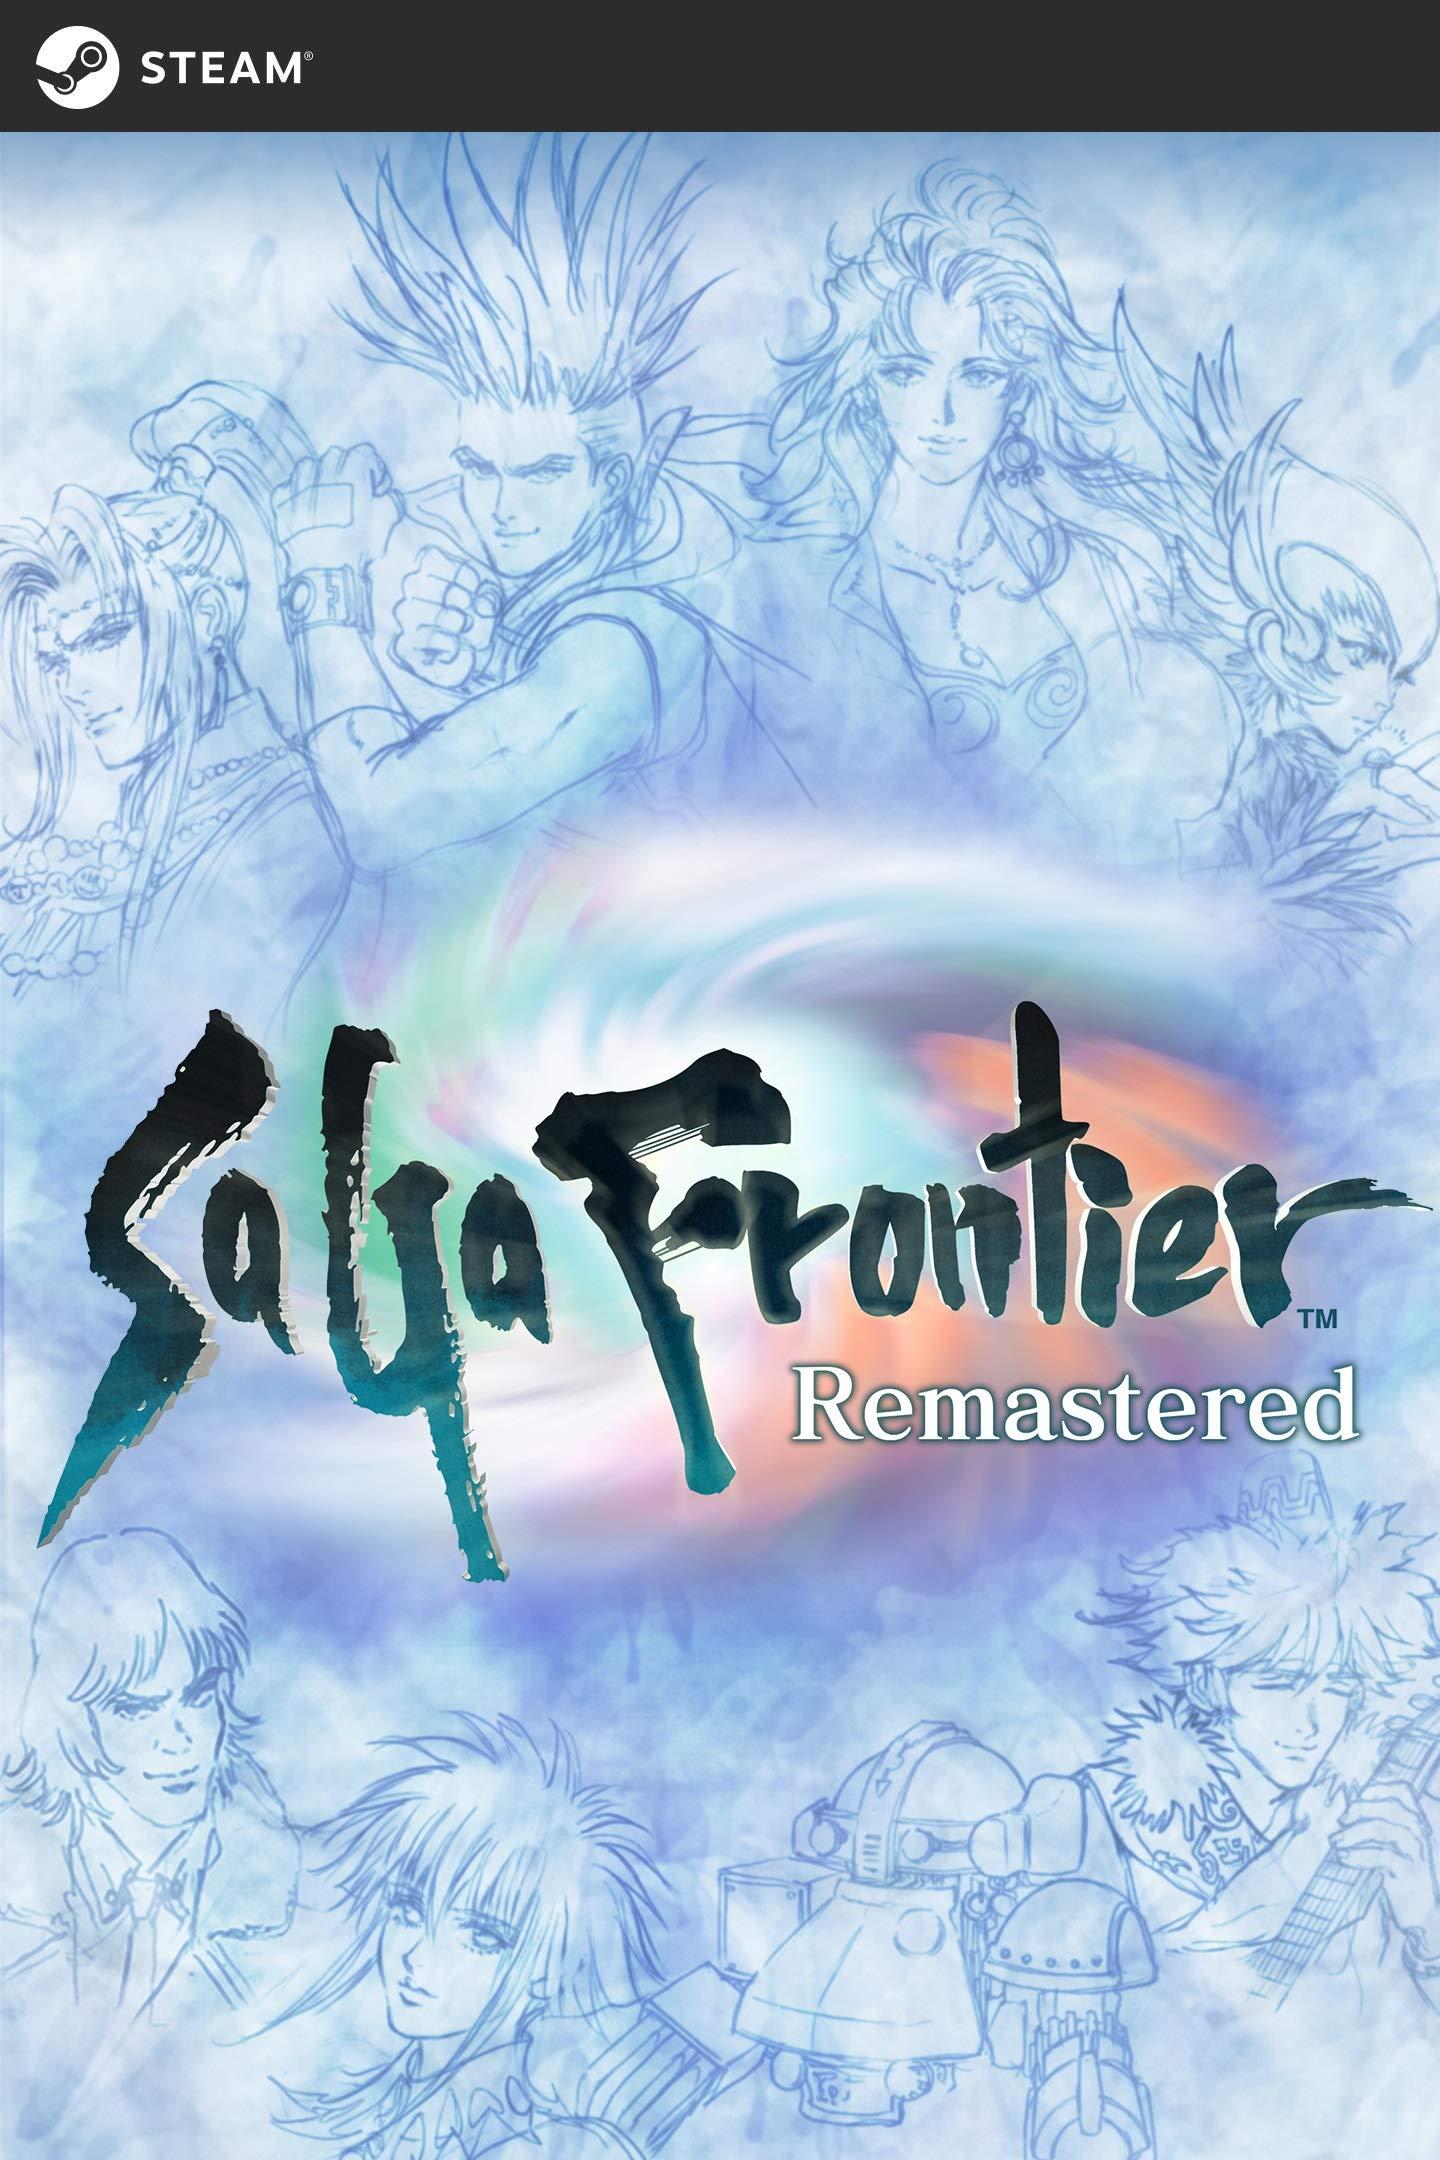 Poster. SaGa Frontier Remastered